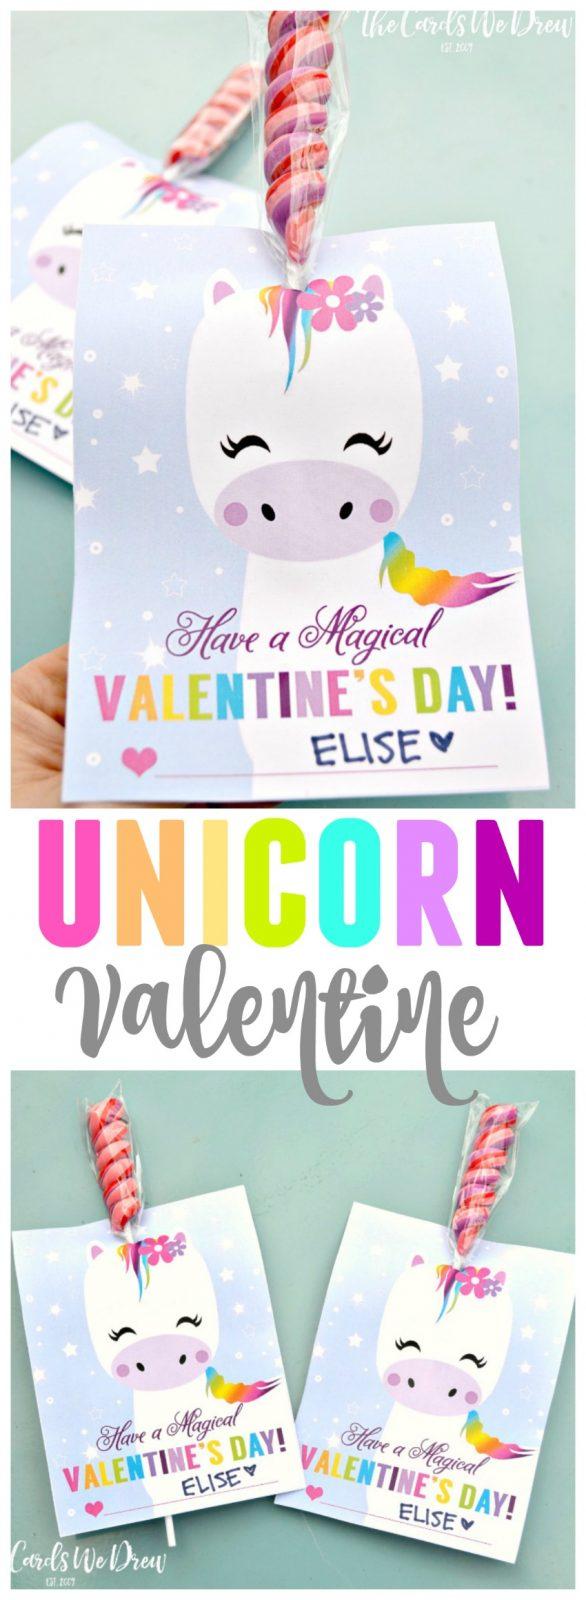 Magical Unicorn Valentine The Cards We Drew